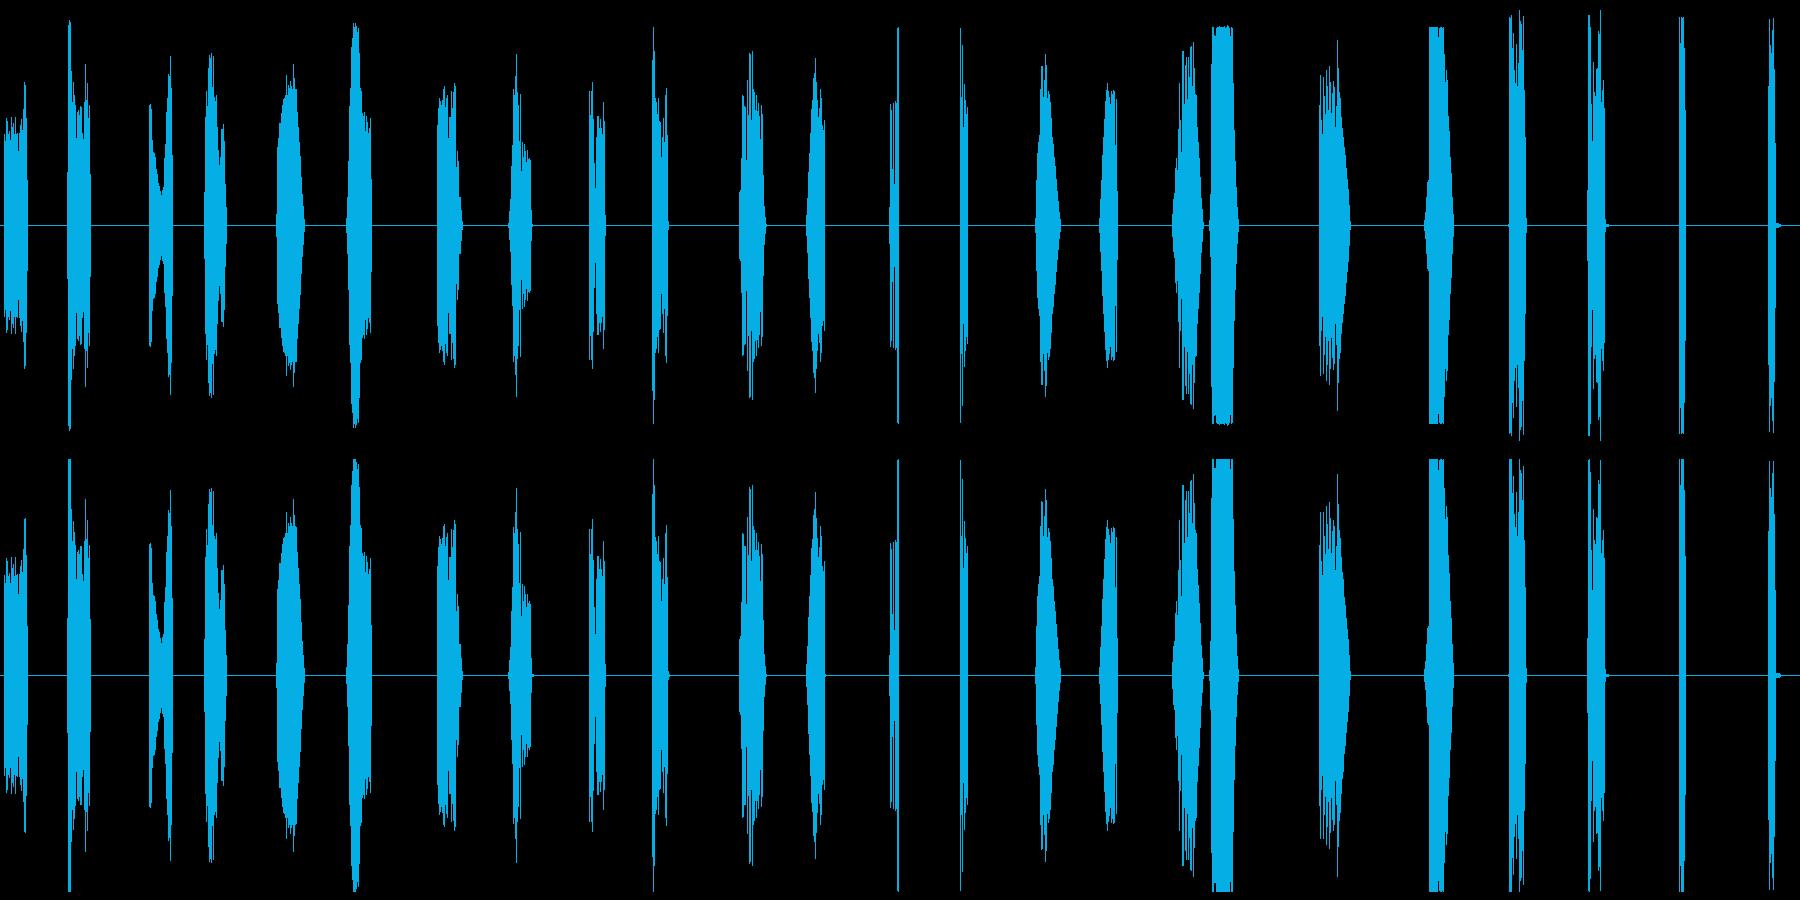 【SFなコンピュータ操作とアラート音】の再生済みの波形